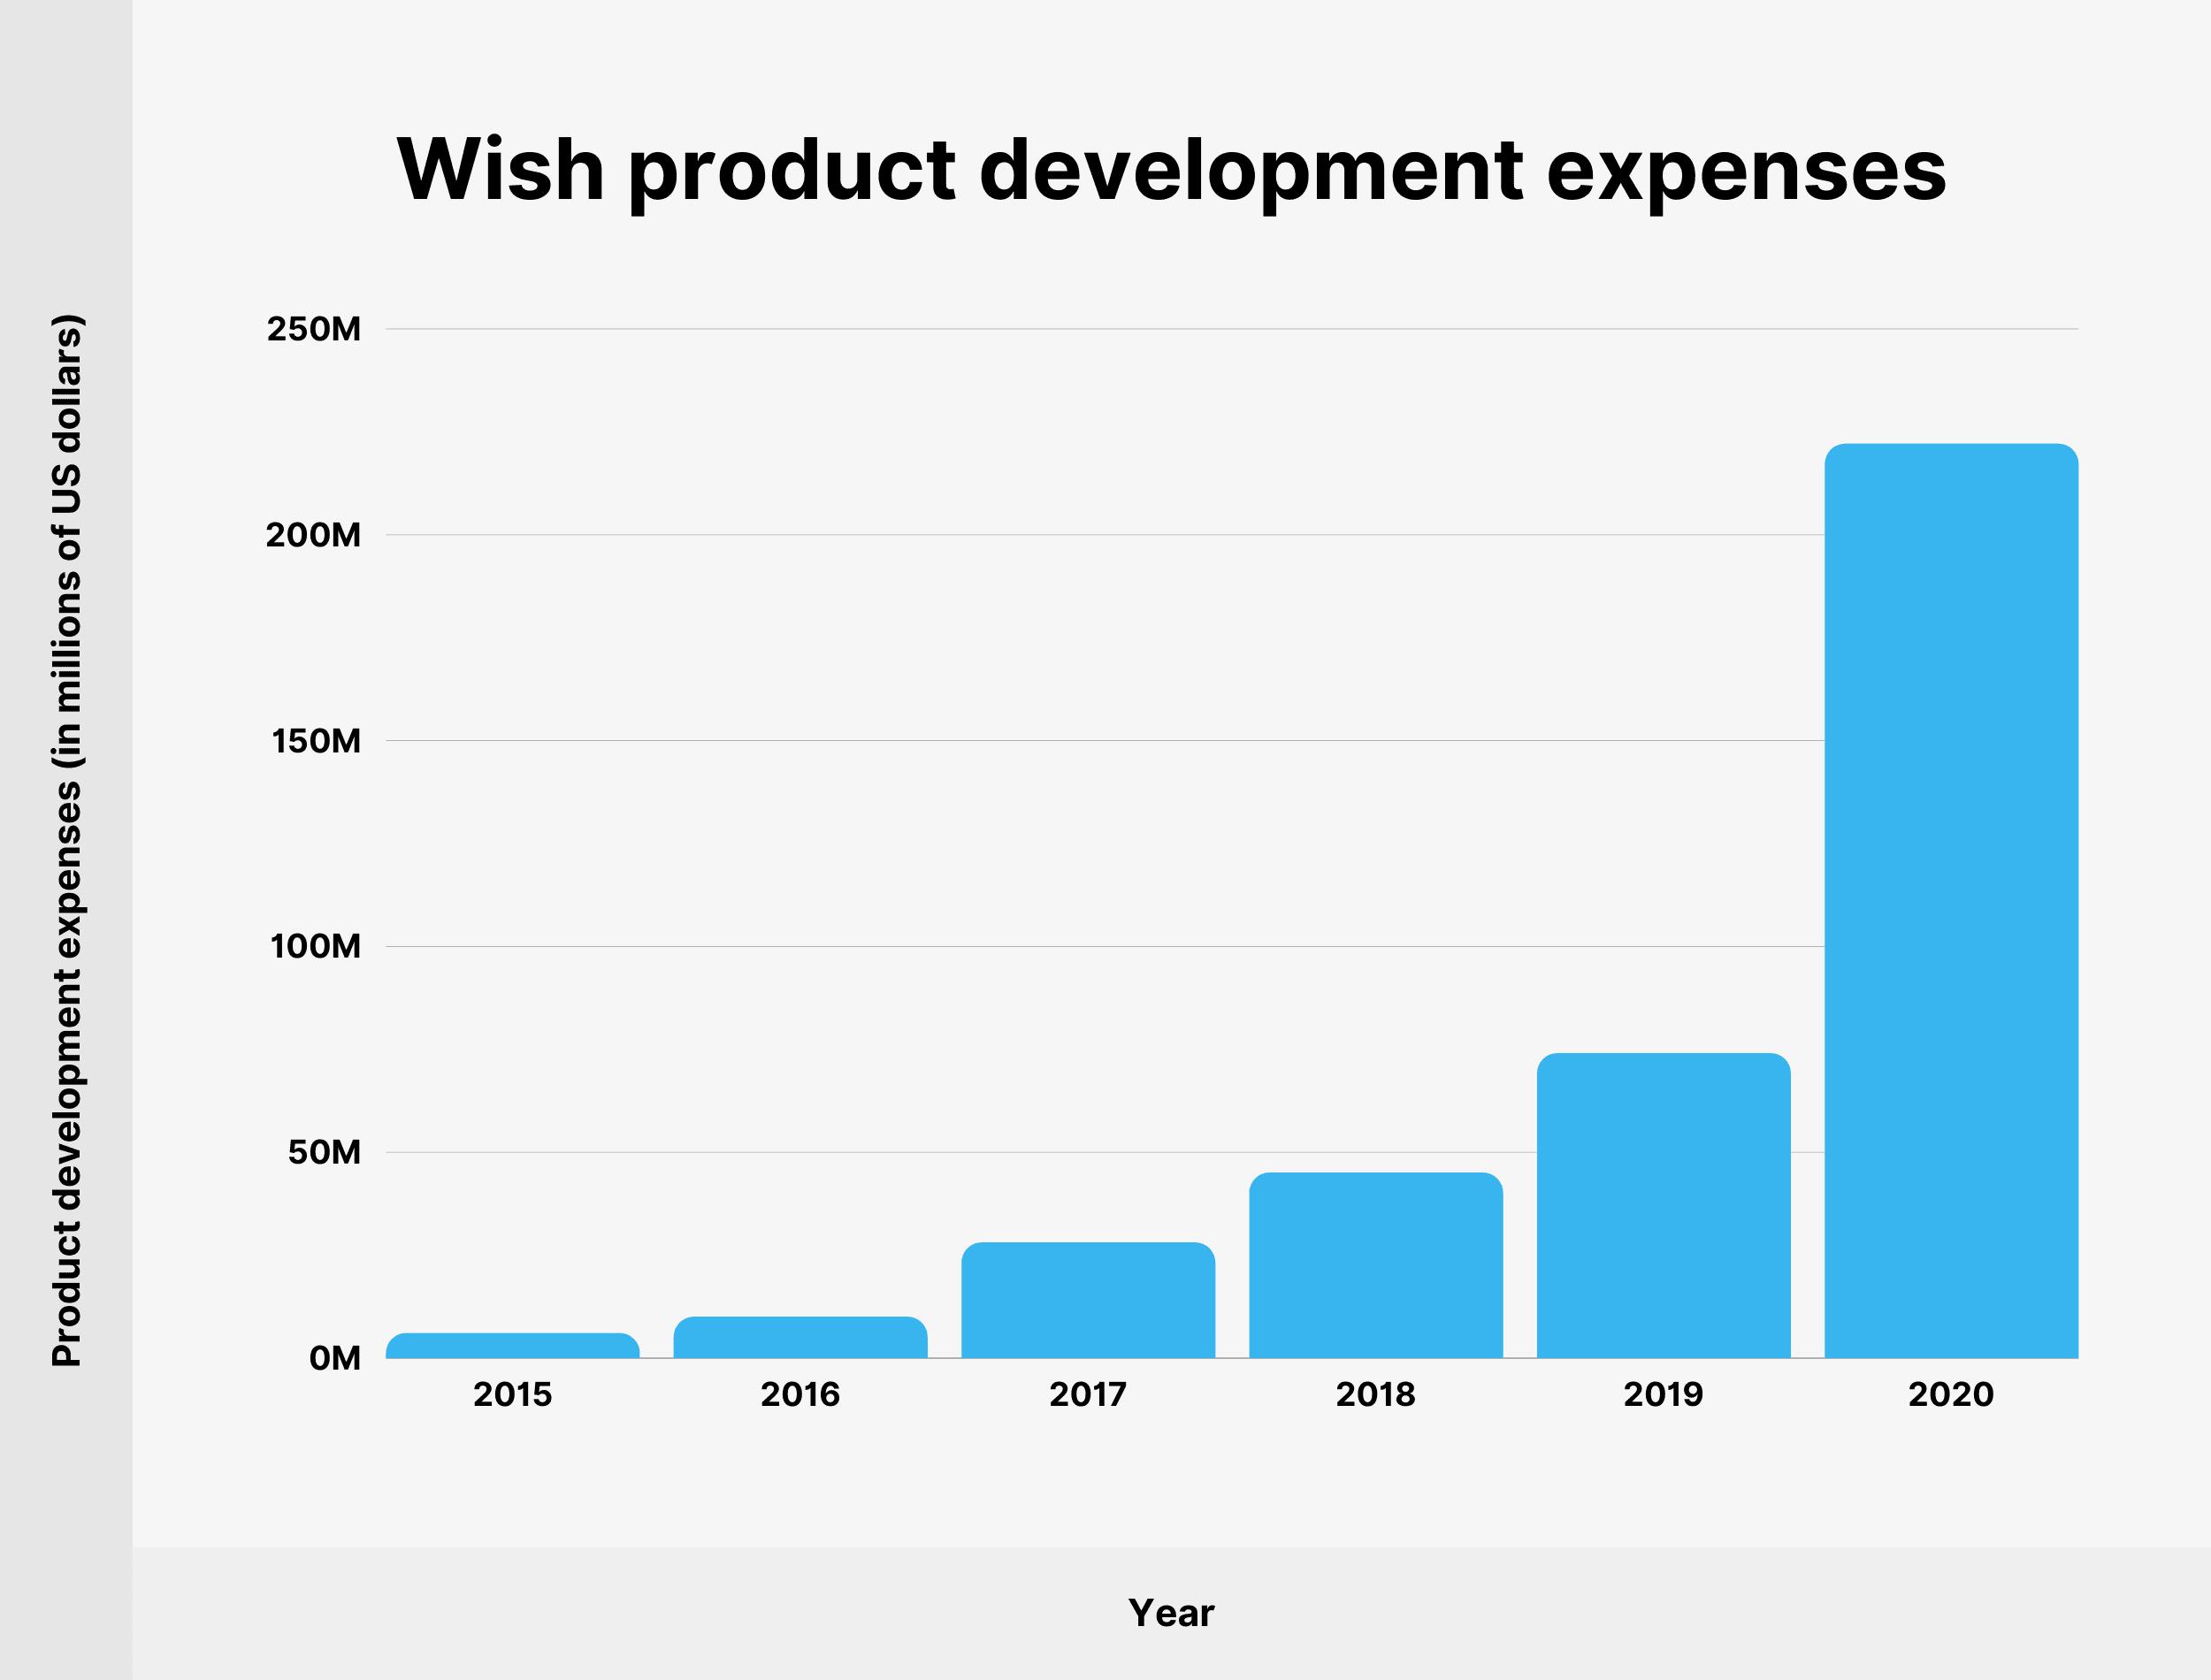 Wish product development expenses